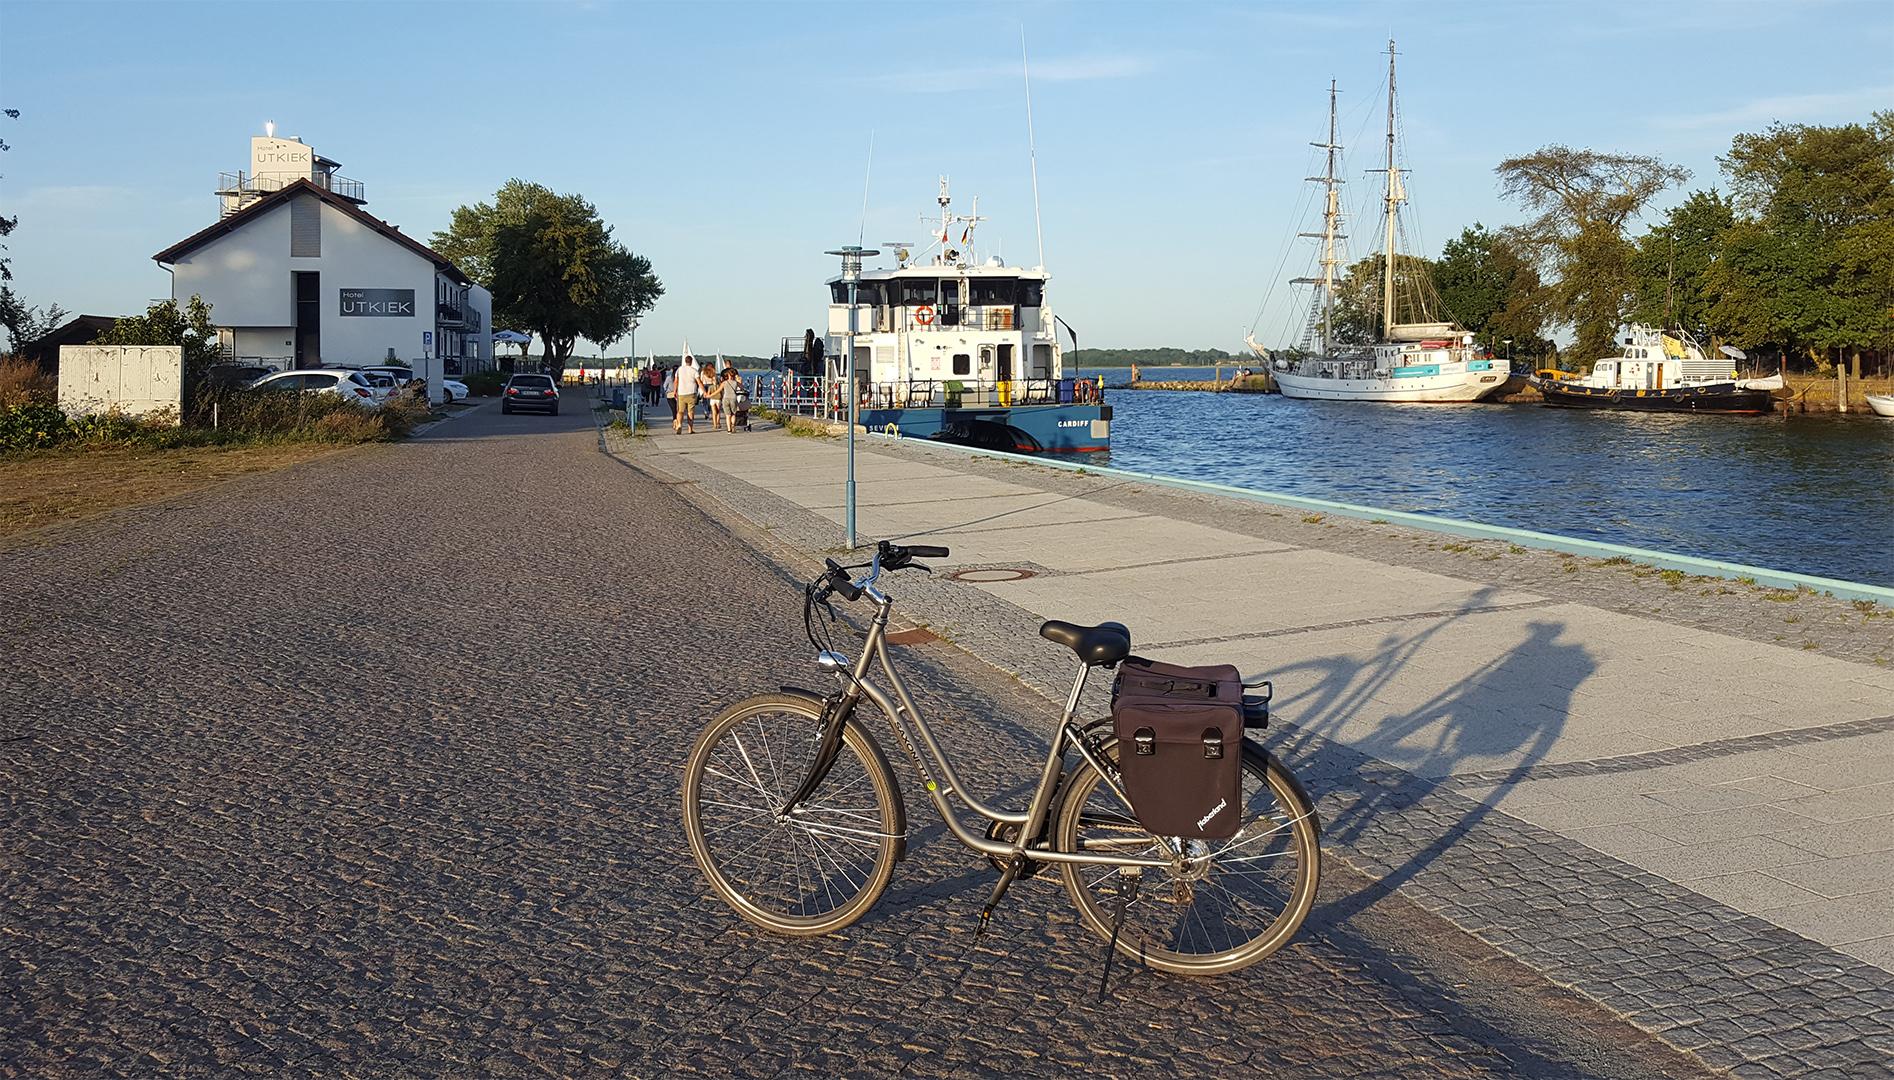 Spätsommerabend in Greifswald-Wieck